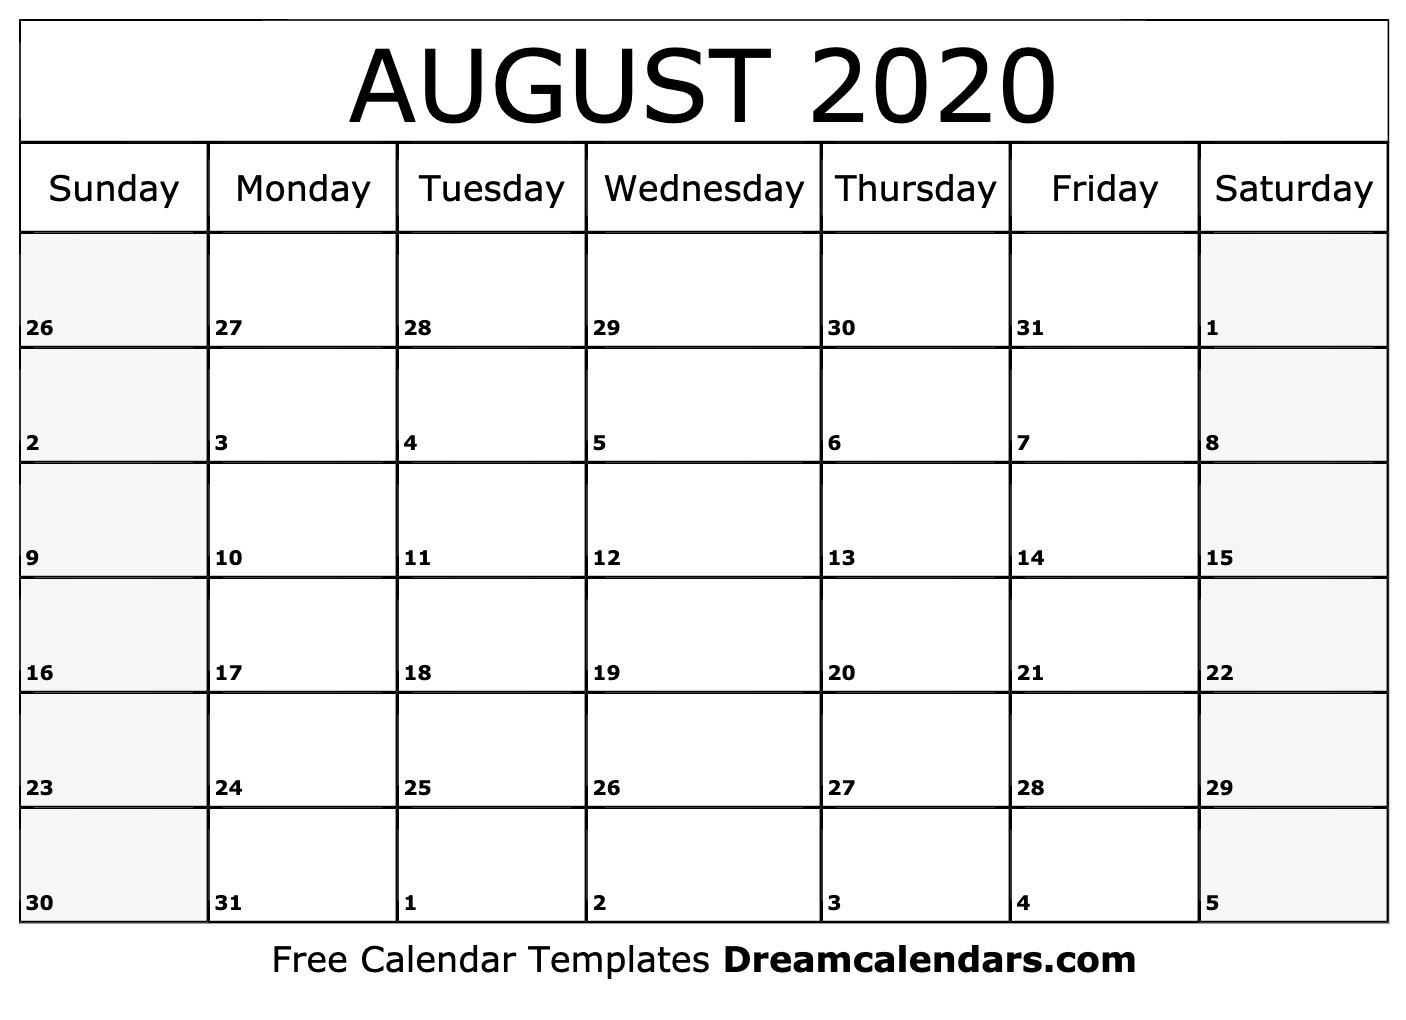 Free Blank August 2020 Printable Calendar-Blank Calendar For August 2020/monday-Friday